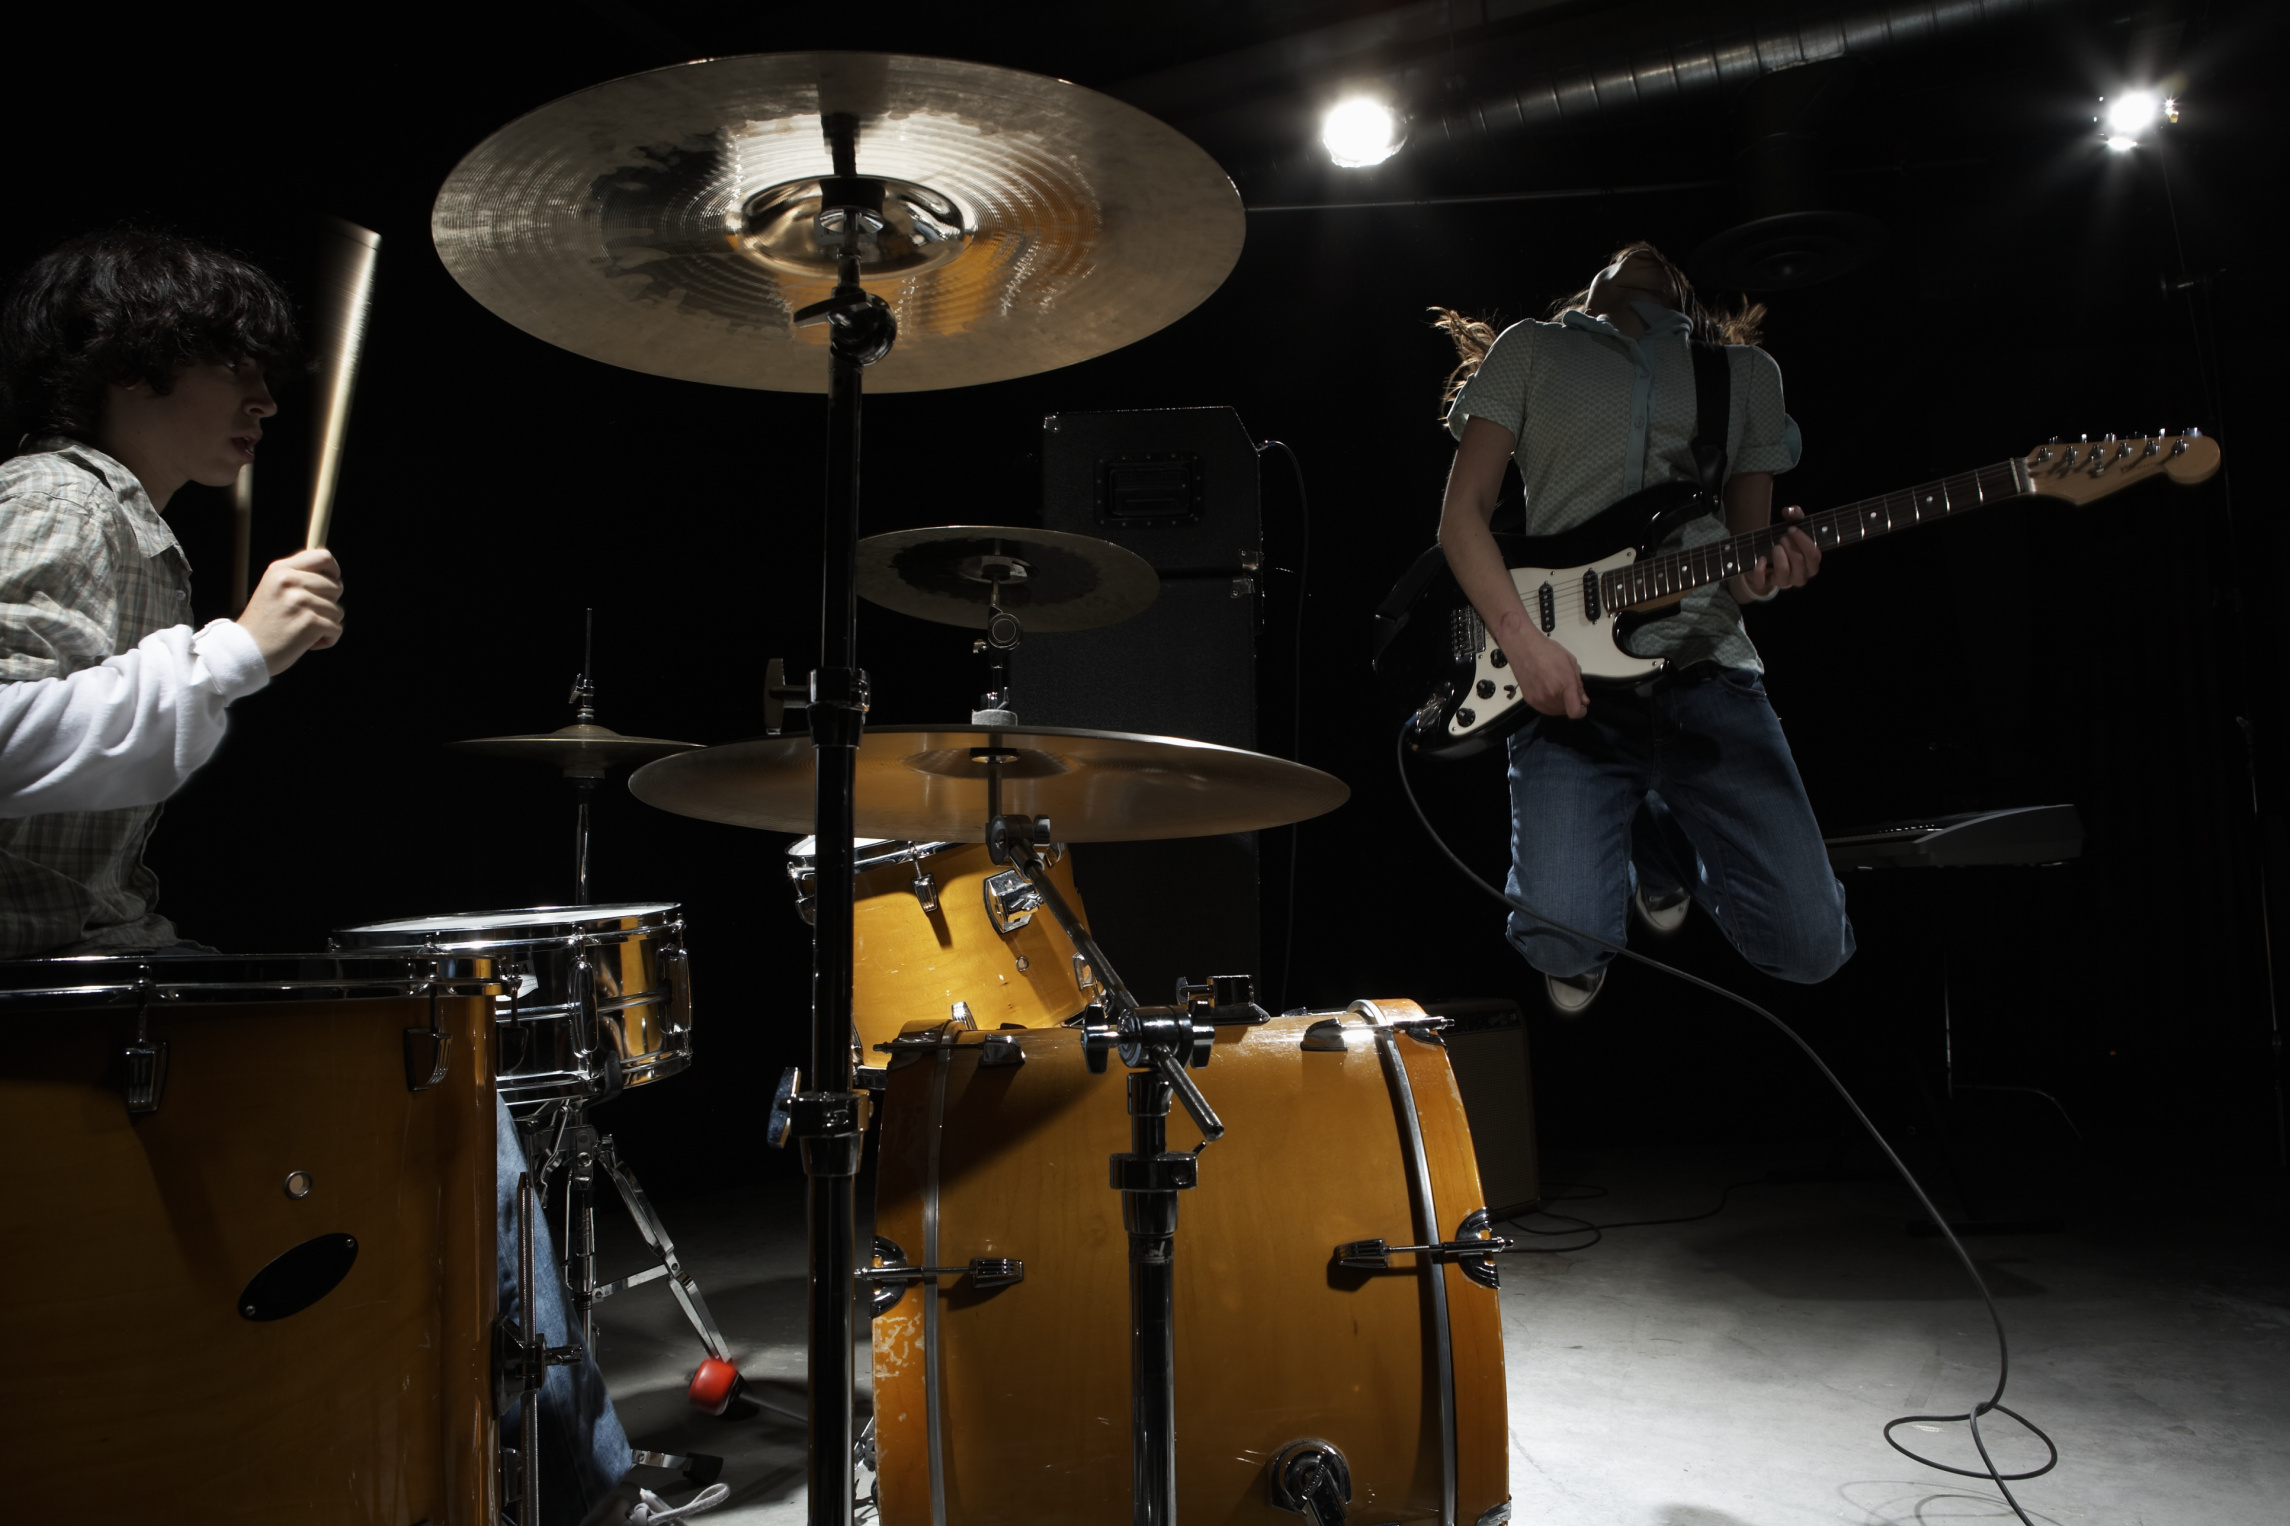 dating slingerland drums număr de serie)